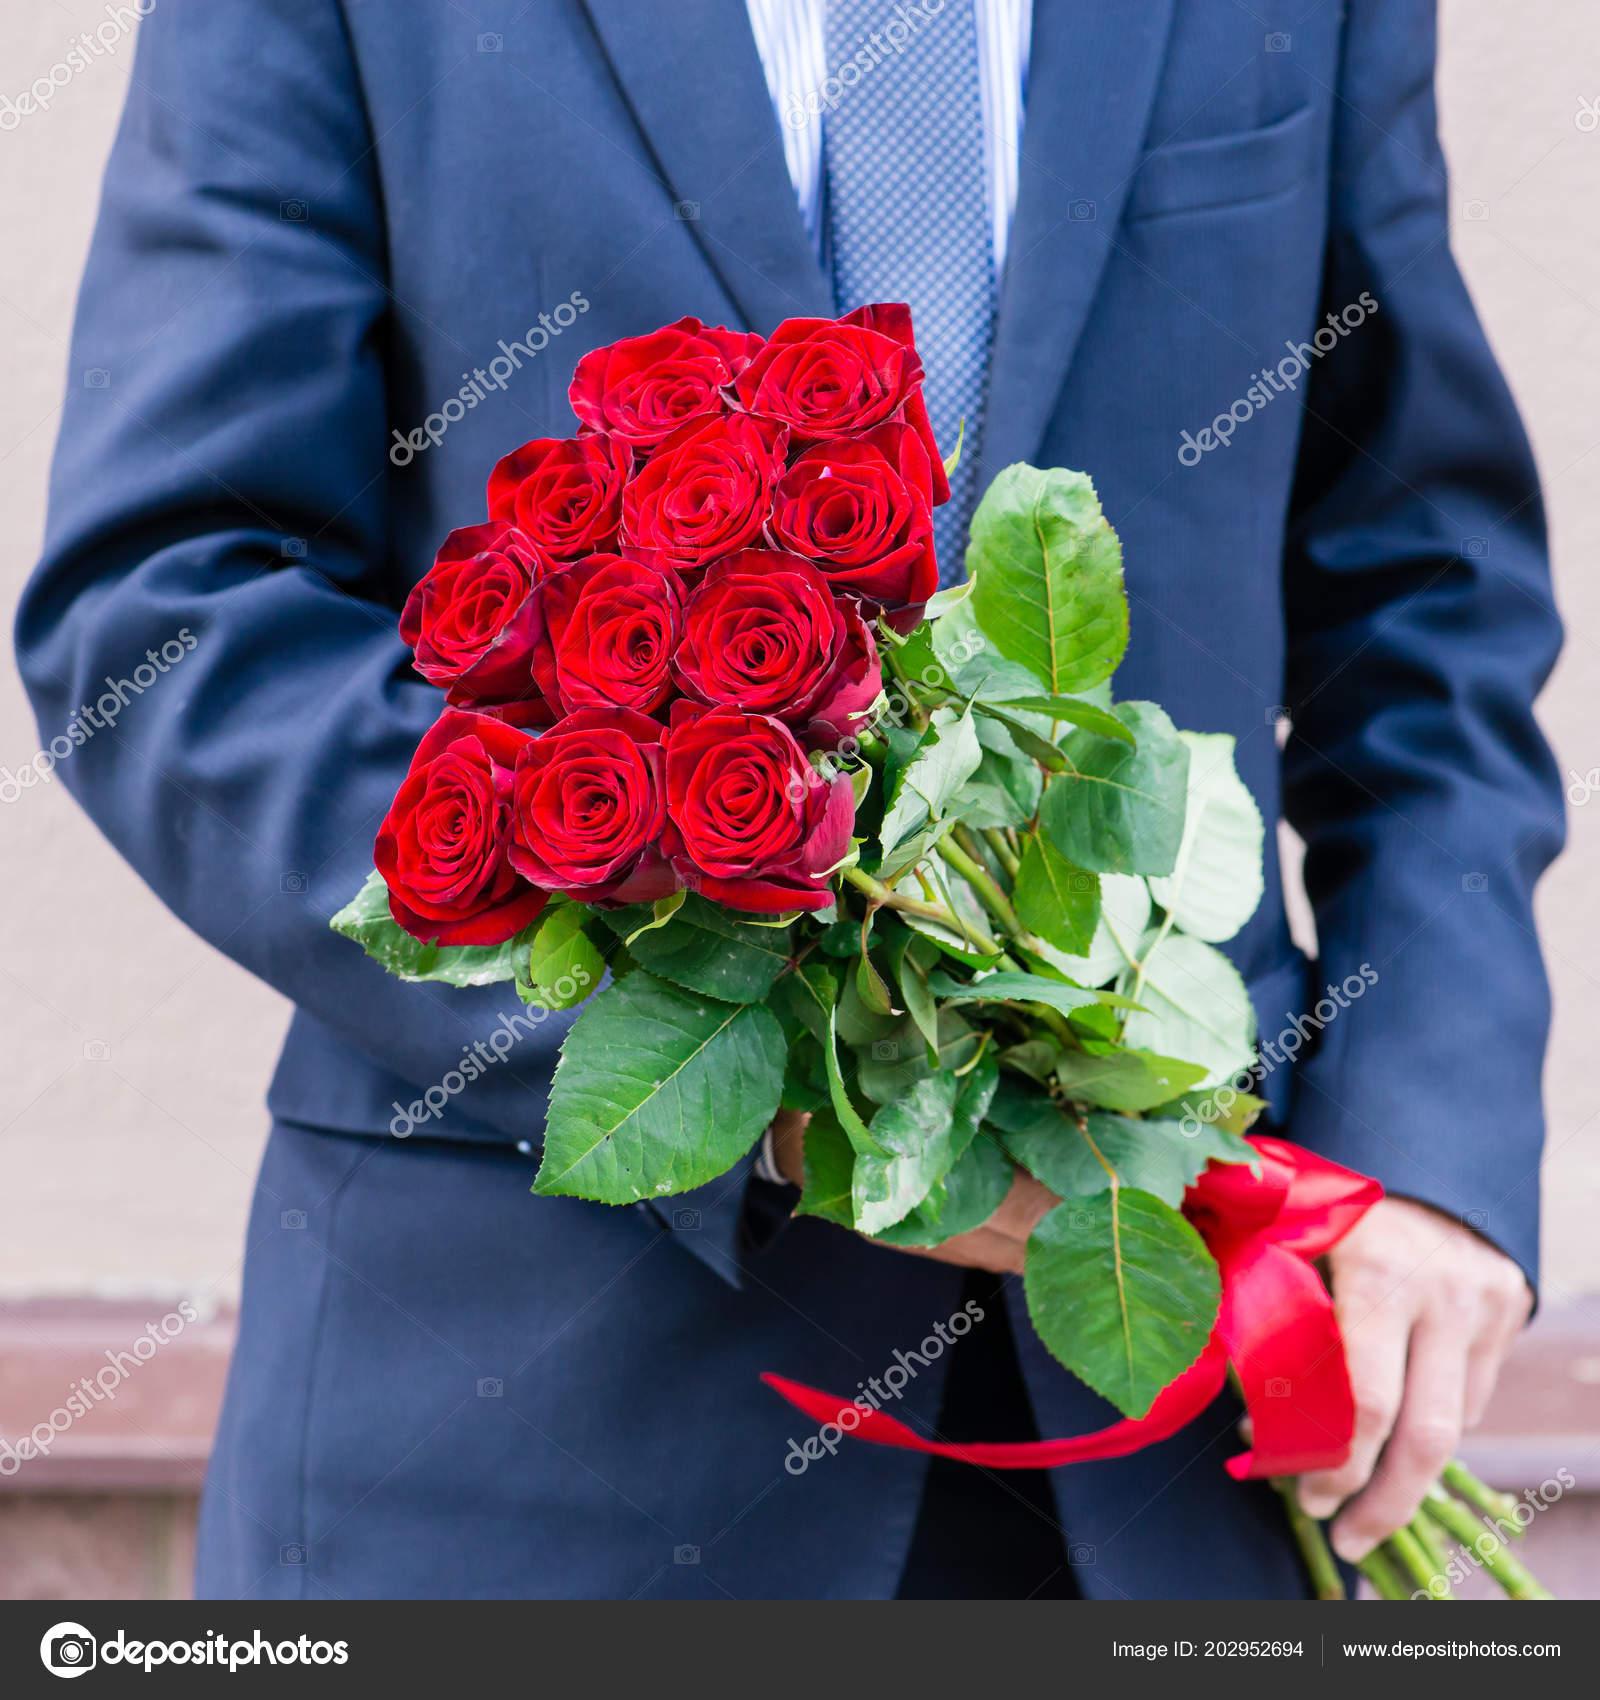 Mazzo Di Fiori Uomo.Man With Bouquet Of Flowers Stock Photo C Smspsy 202952694